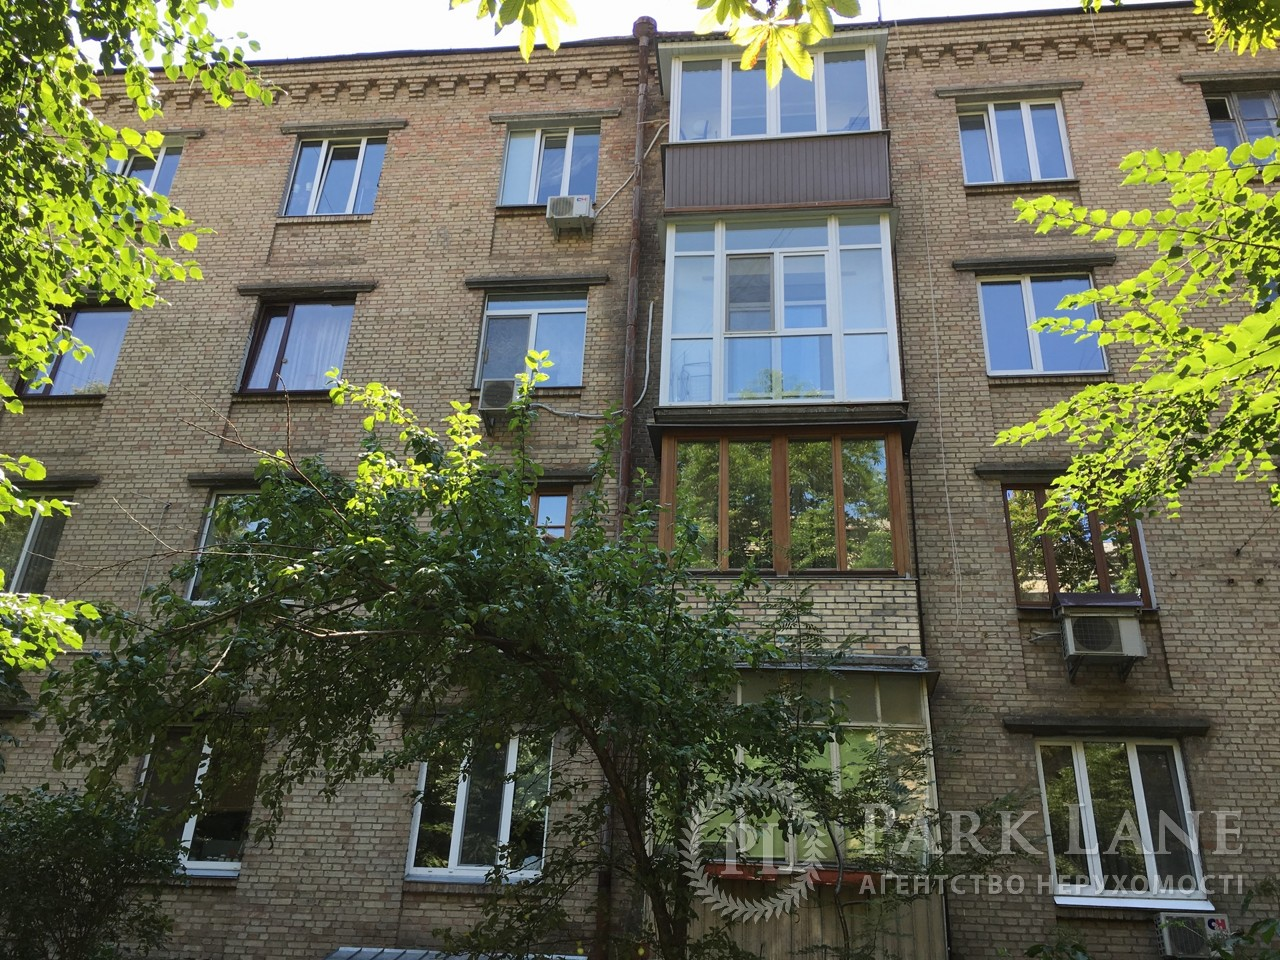 Квартира Гордиенко Костя пер. (Чекистов пер.), 5, Киев, Z-233422 - Фото 12